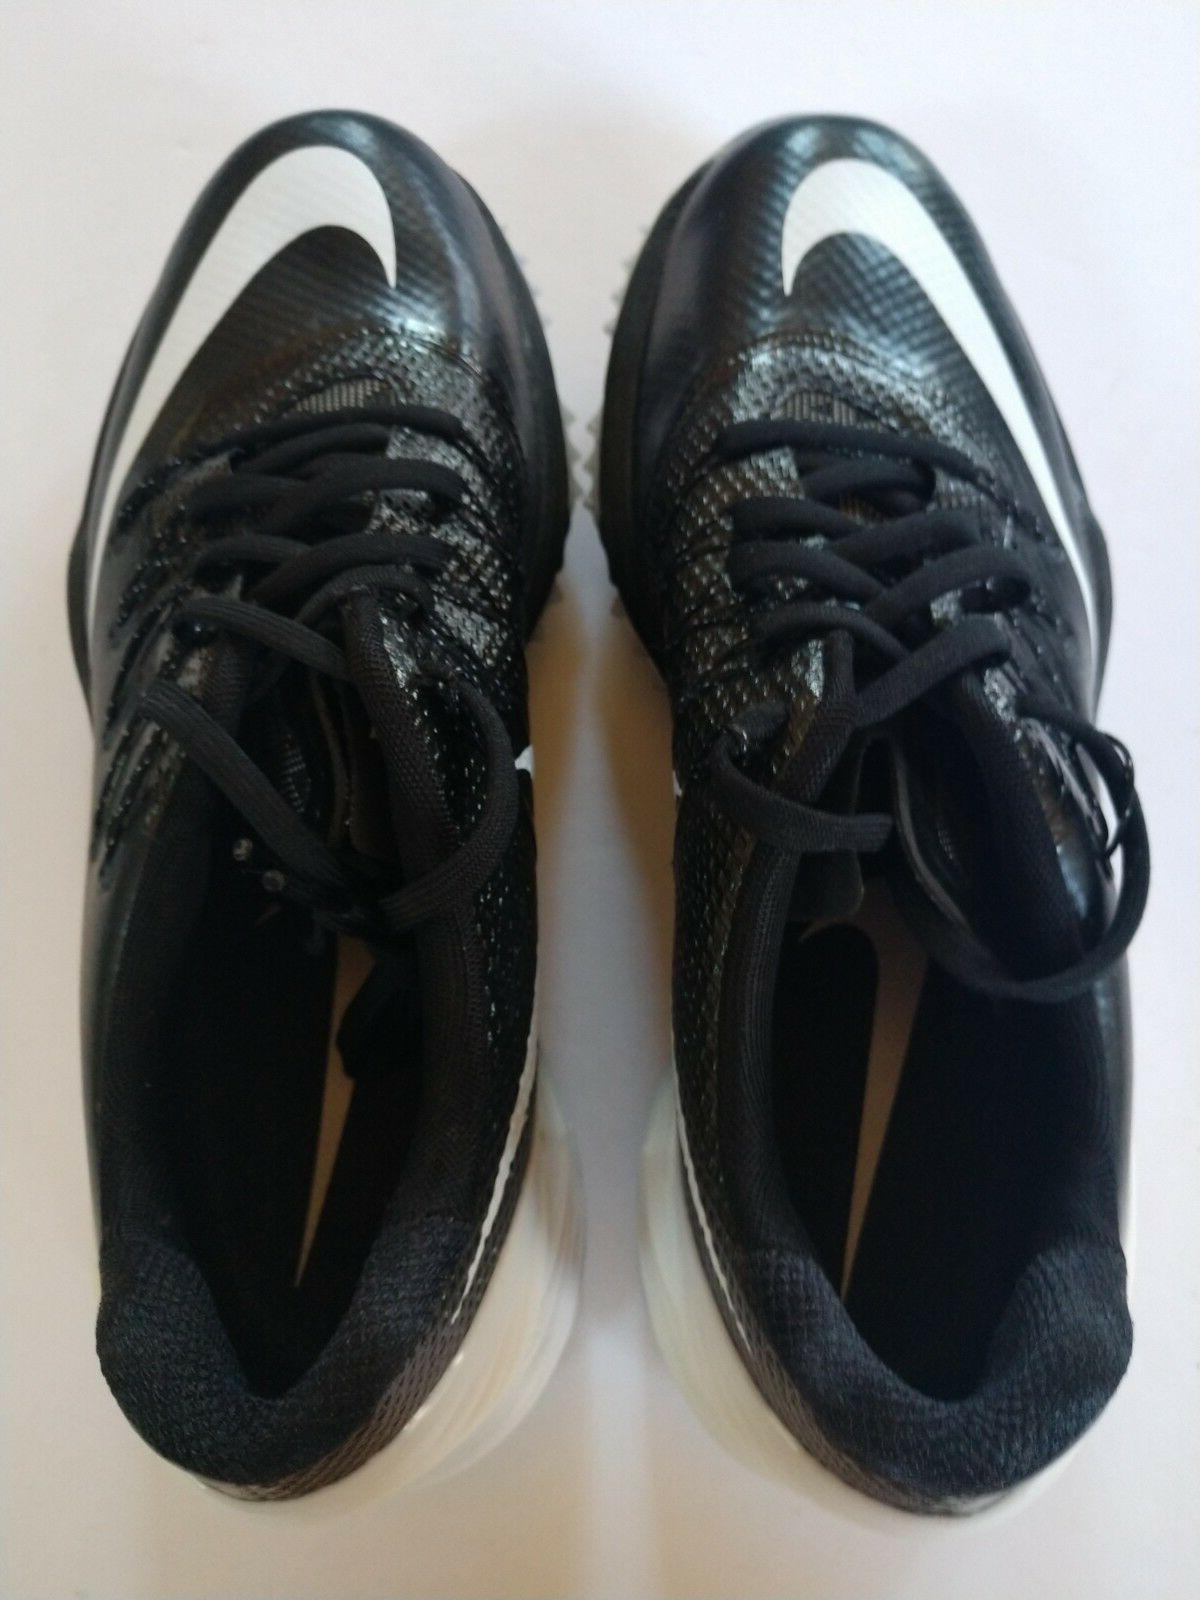 NEW Nike Control Black size 7.5